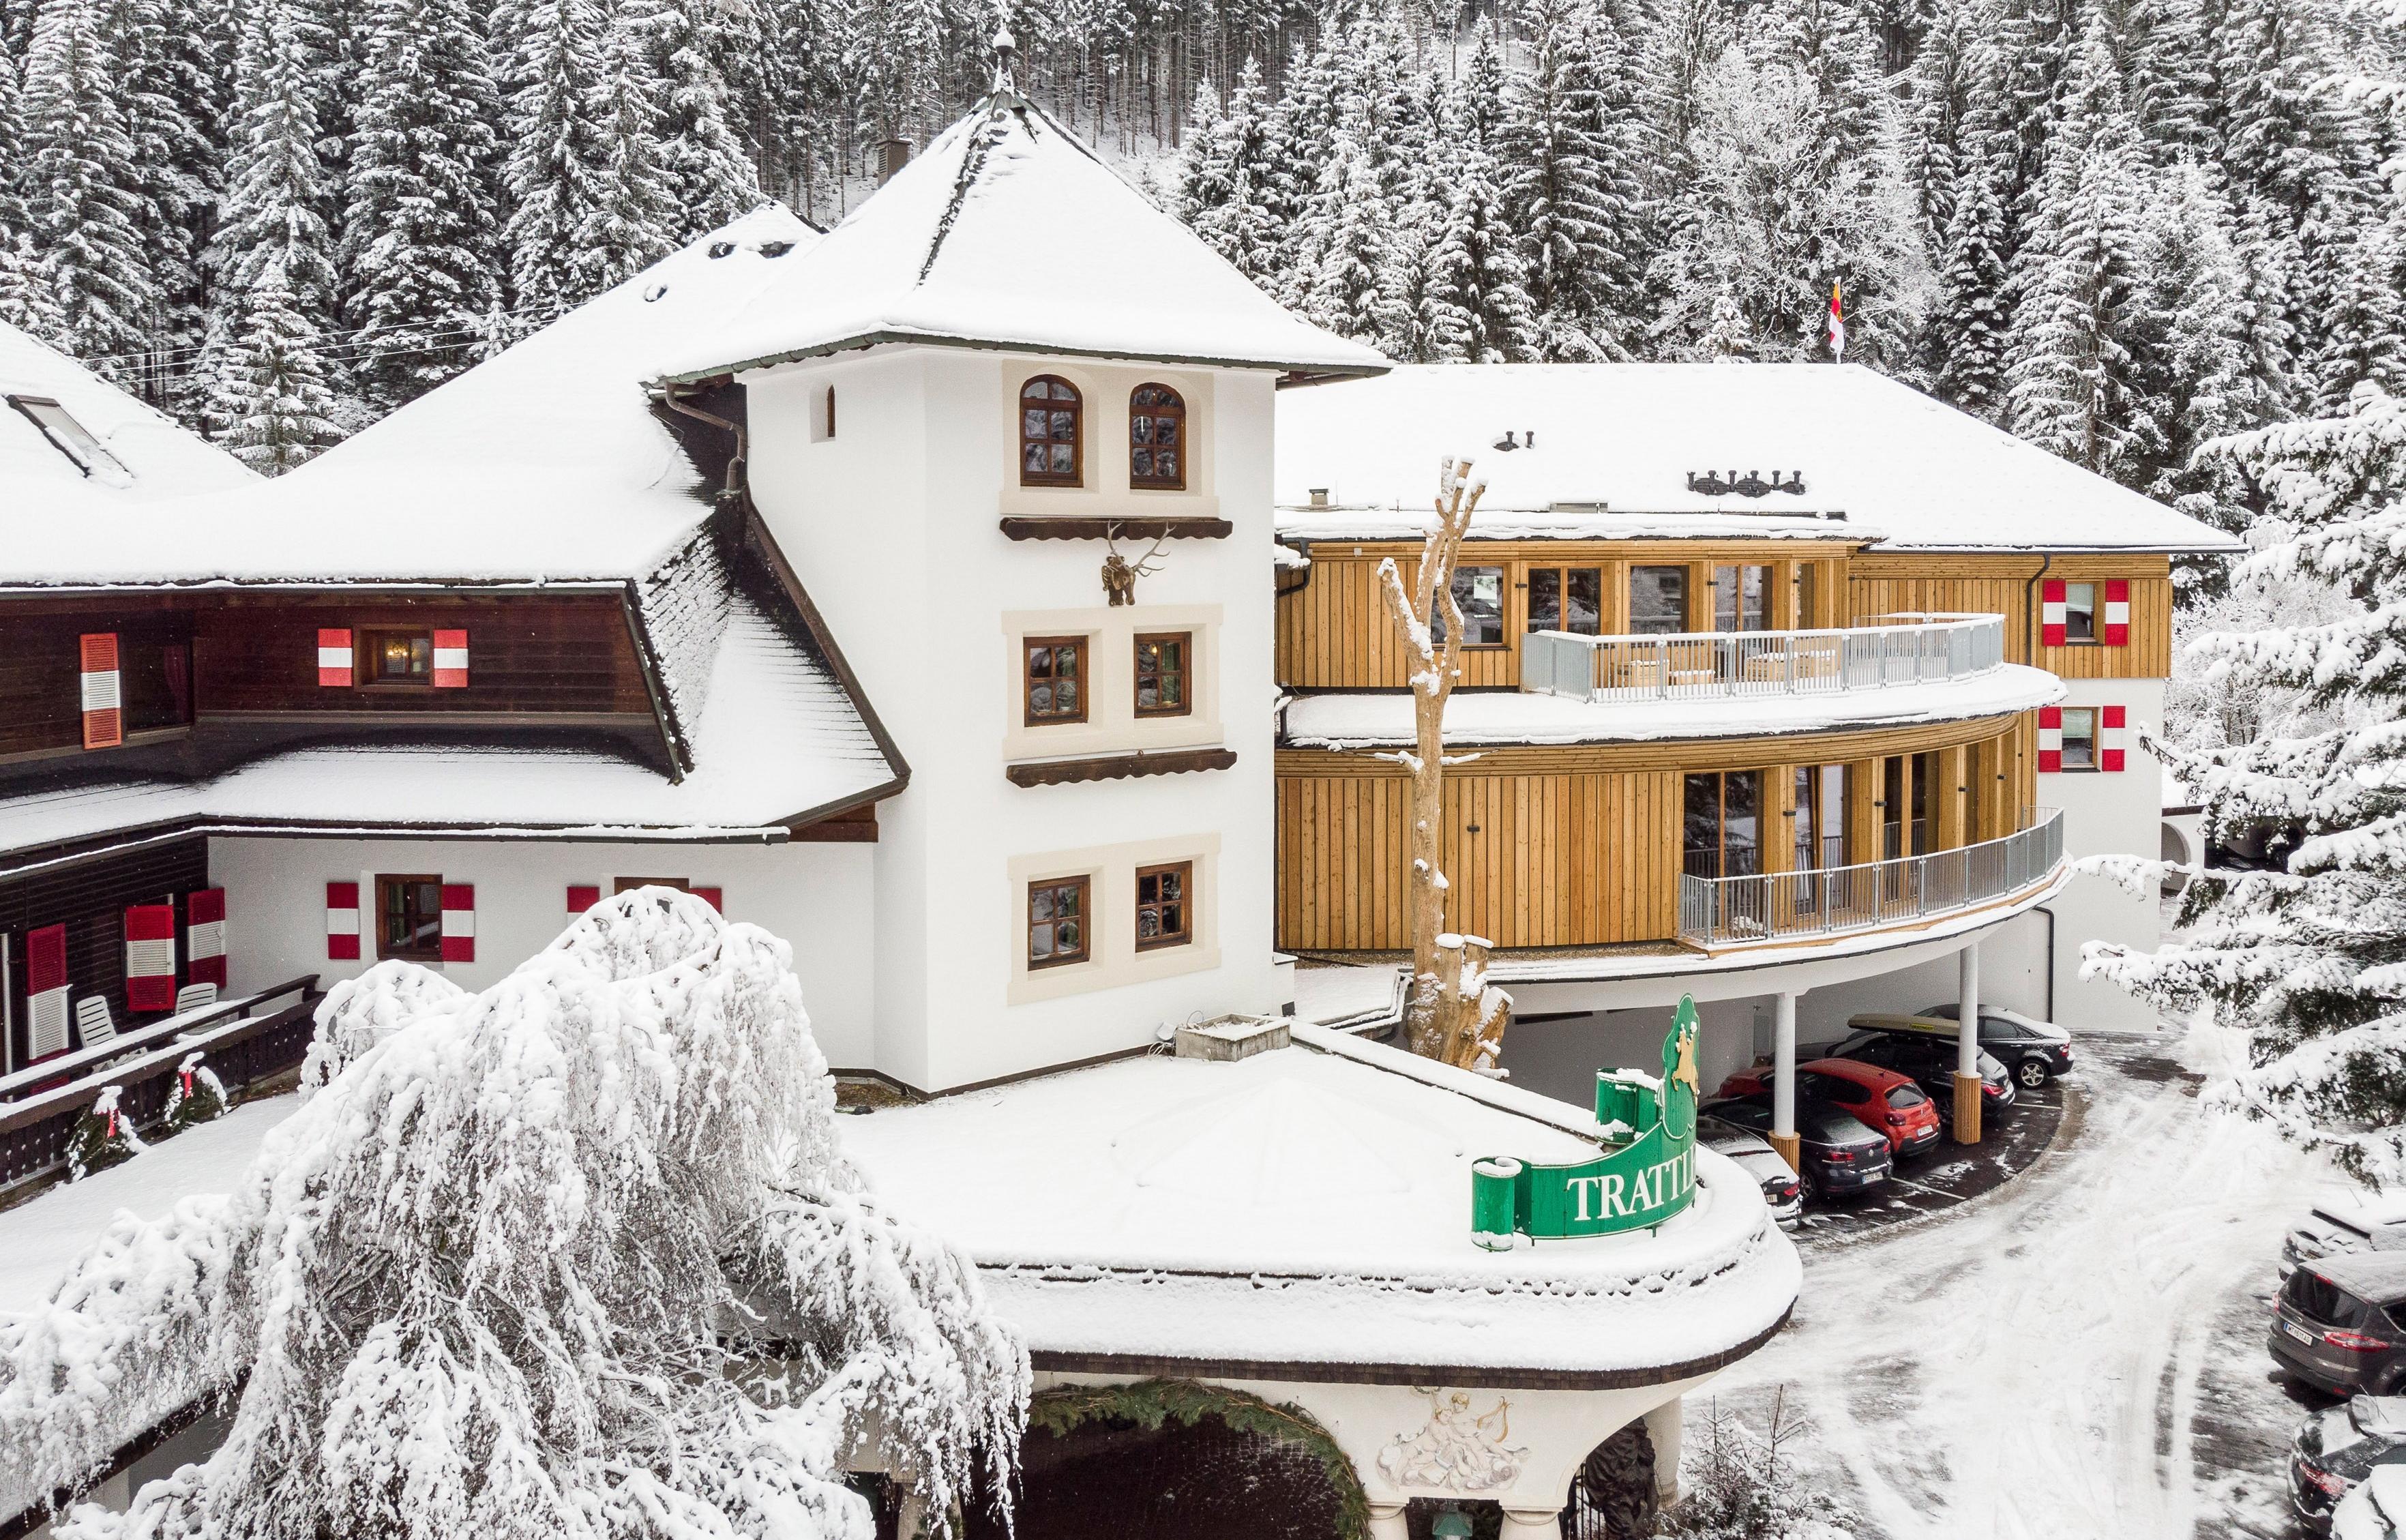 Hotel Trattlerhof Karinthië